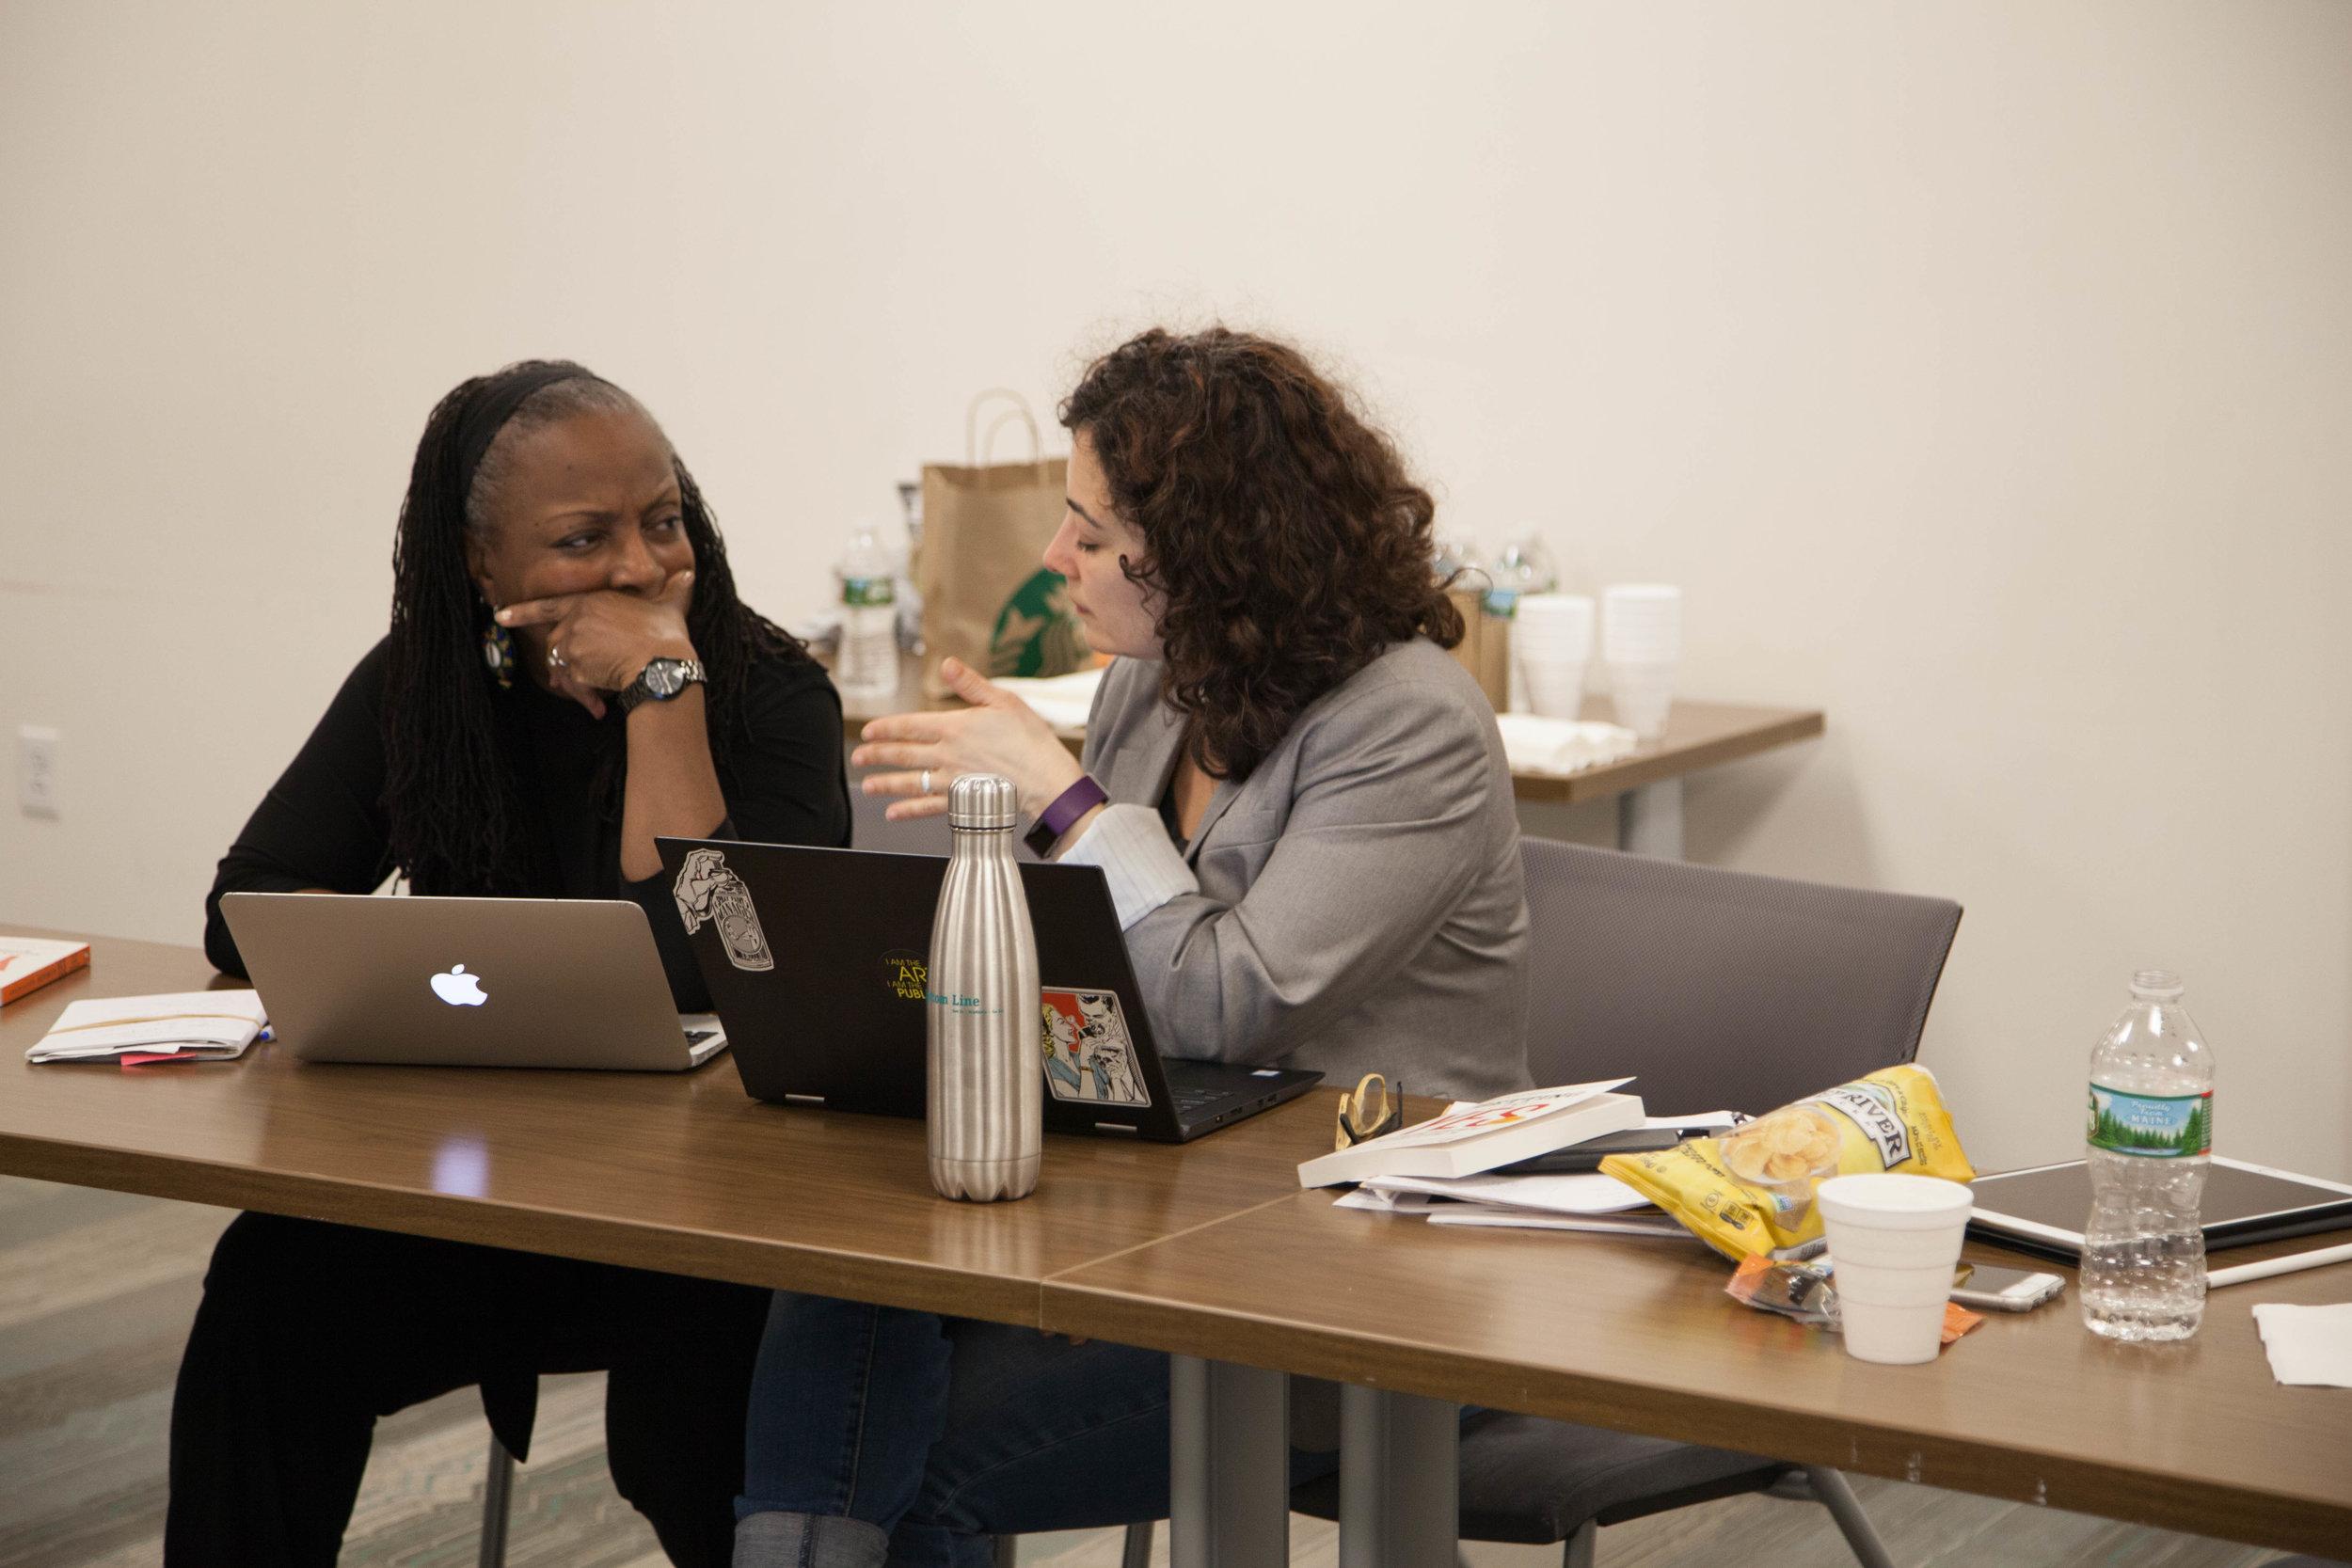 Now + There Accelerator artists Ekua Holmes and Lina Maria Giraldo discuss digital outreach.